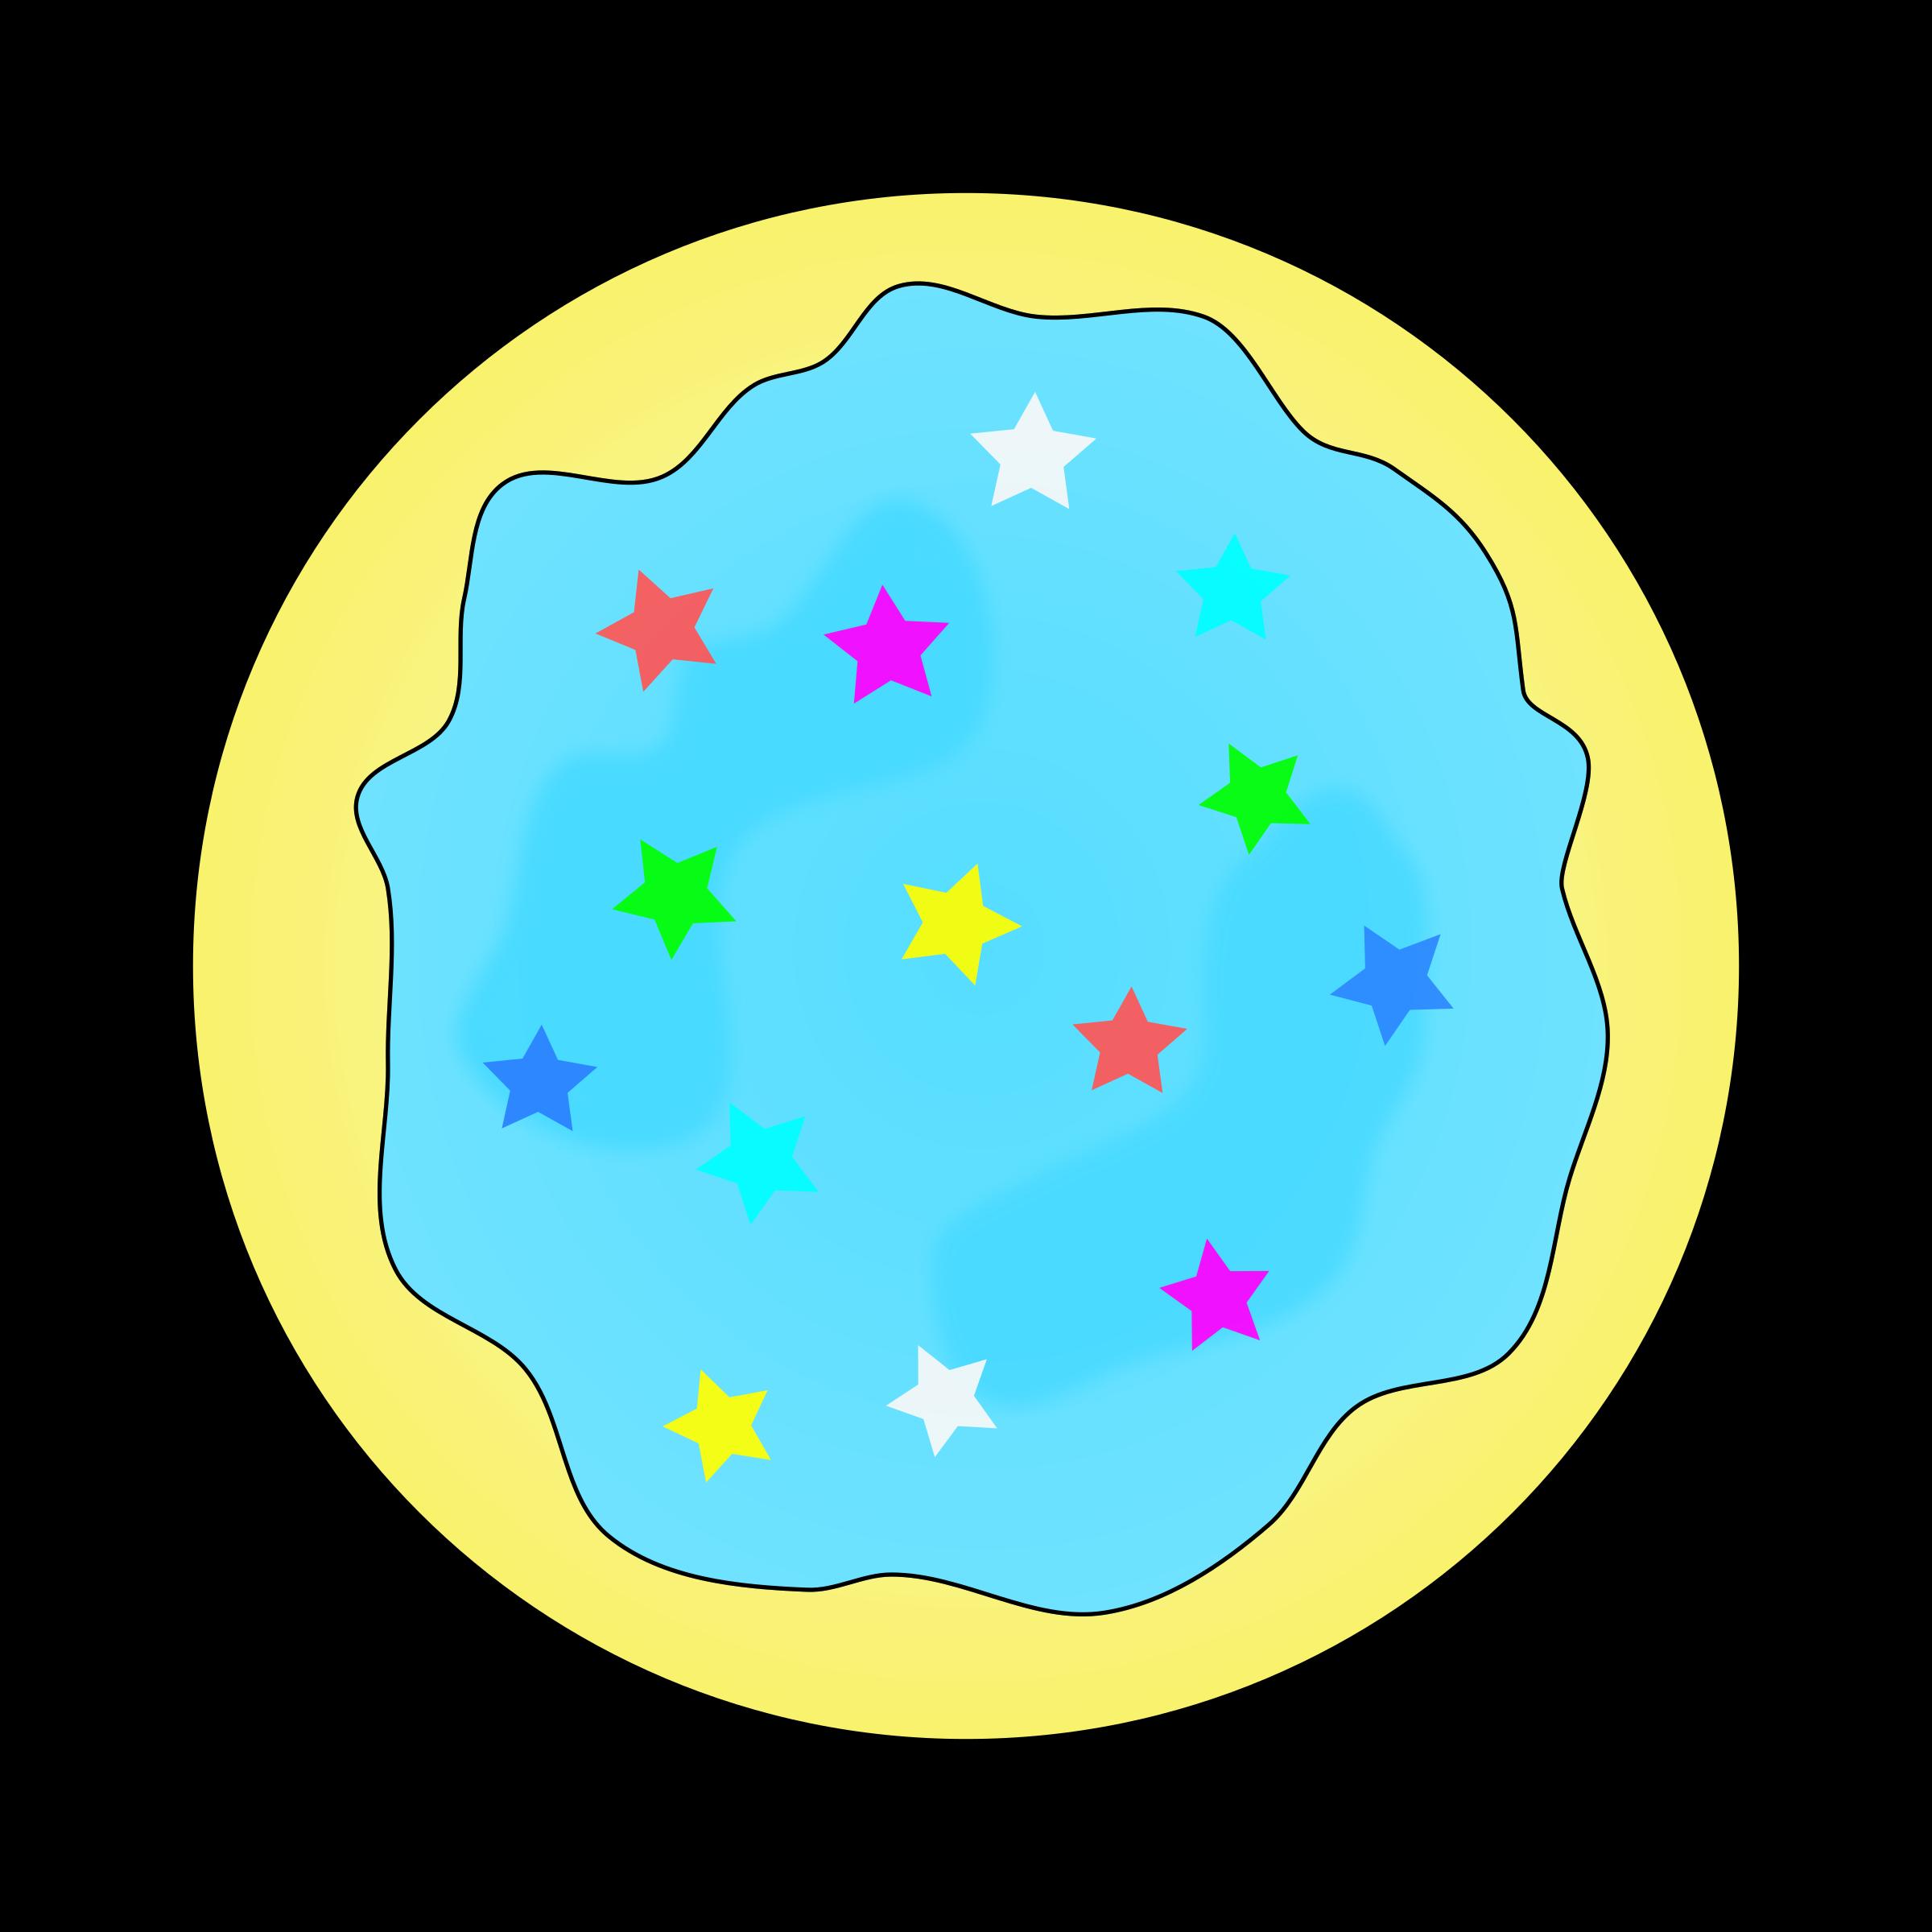 Sugar cookie cliparts free download clip art.